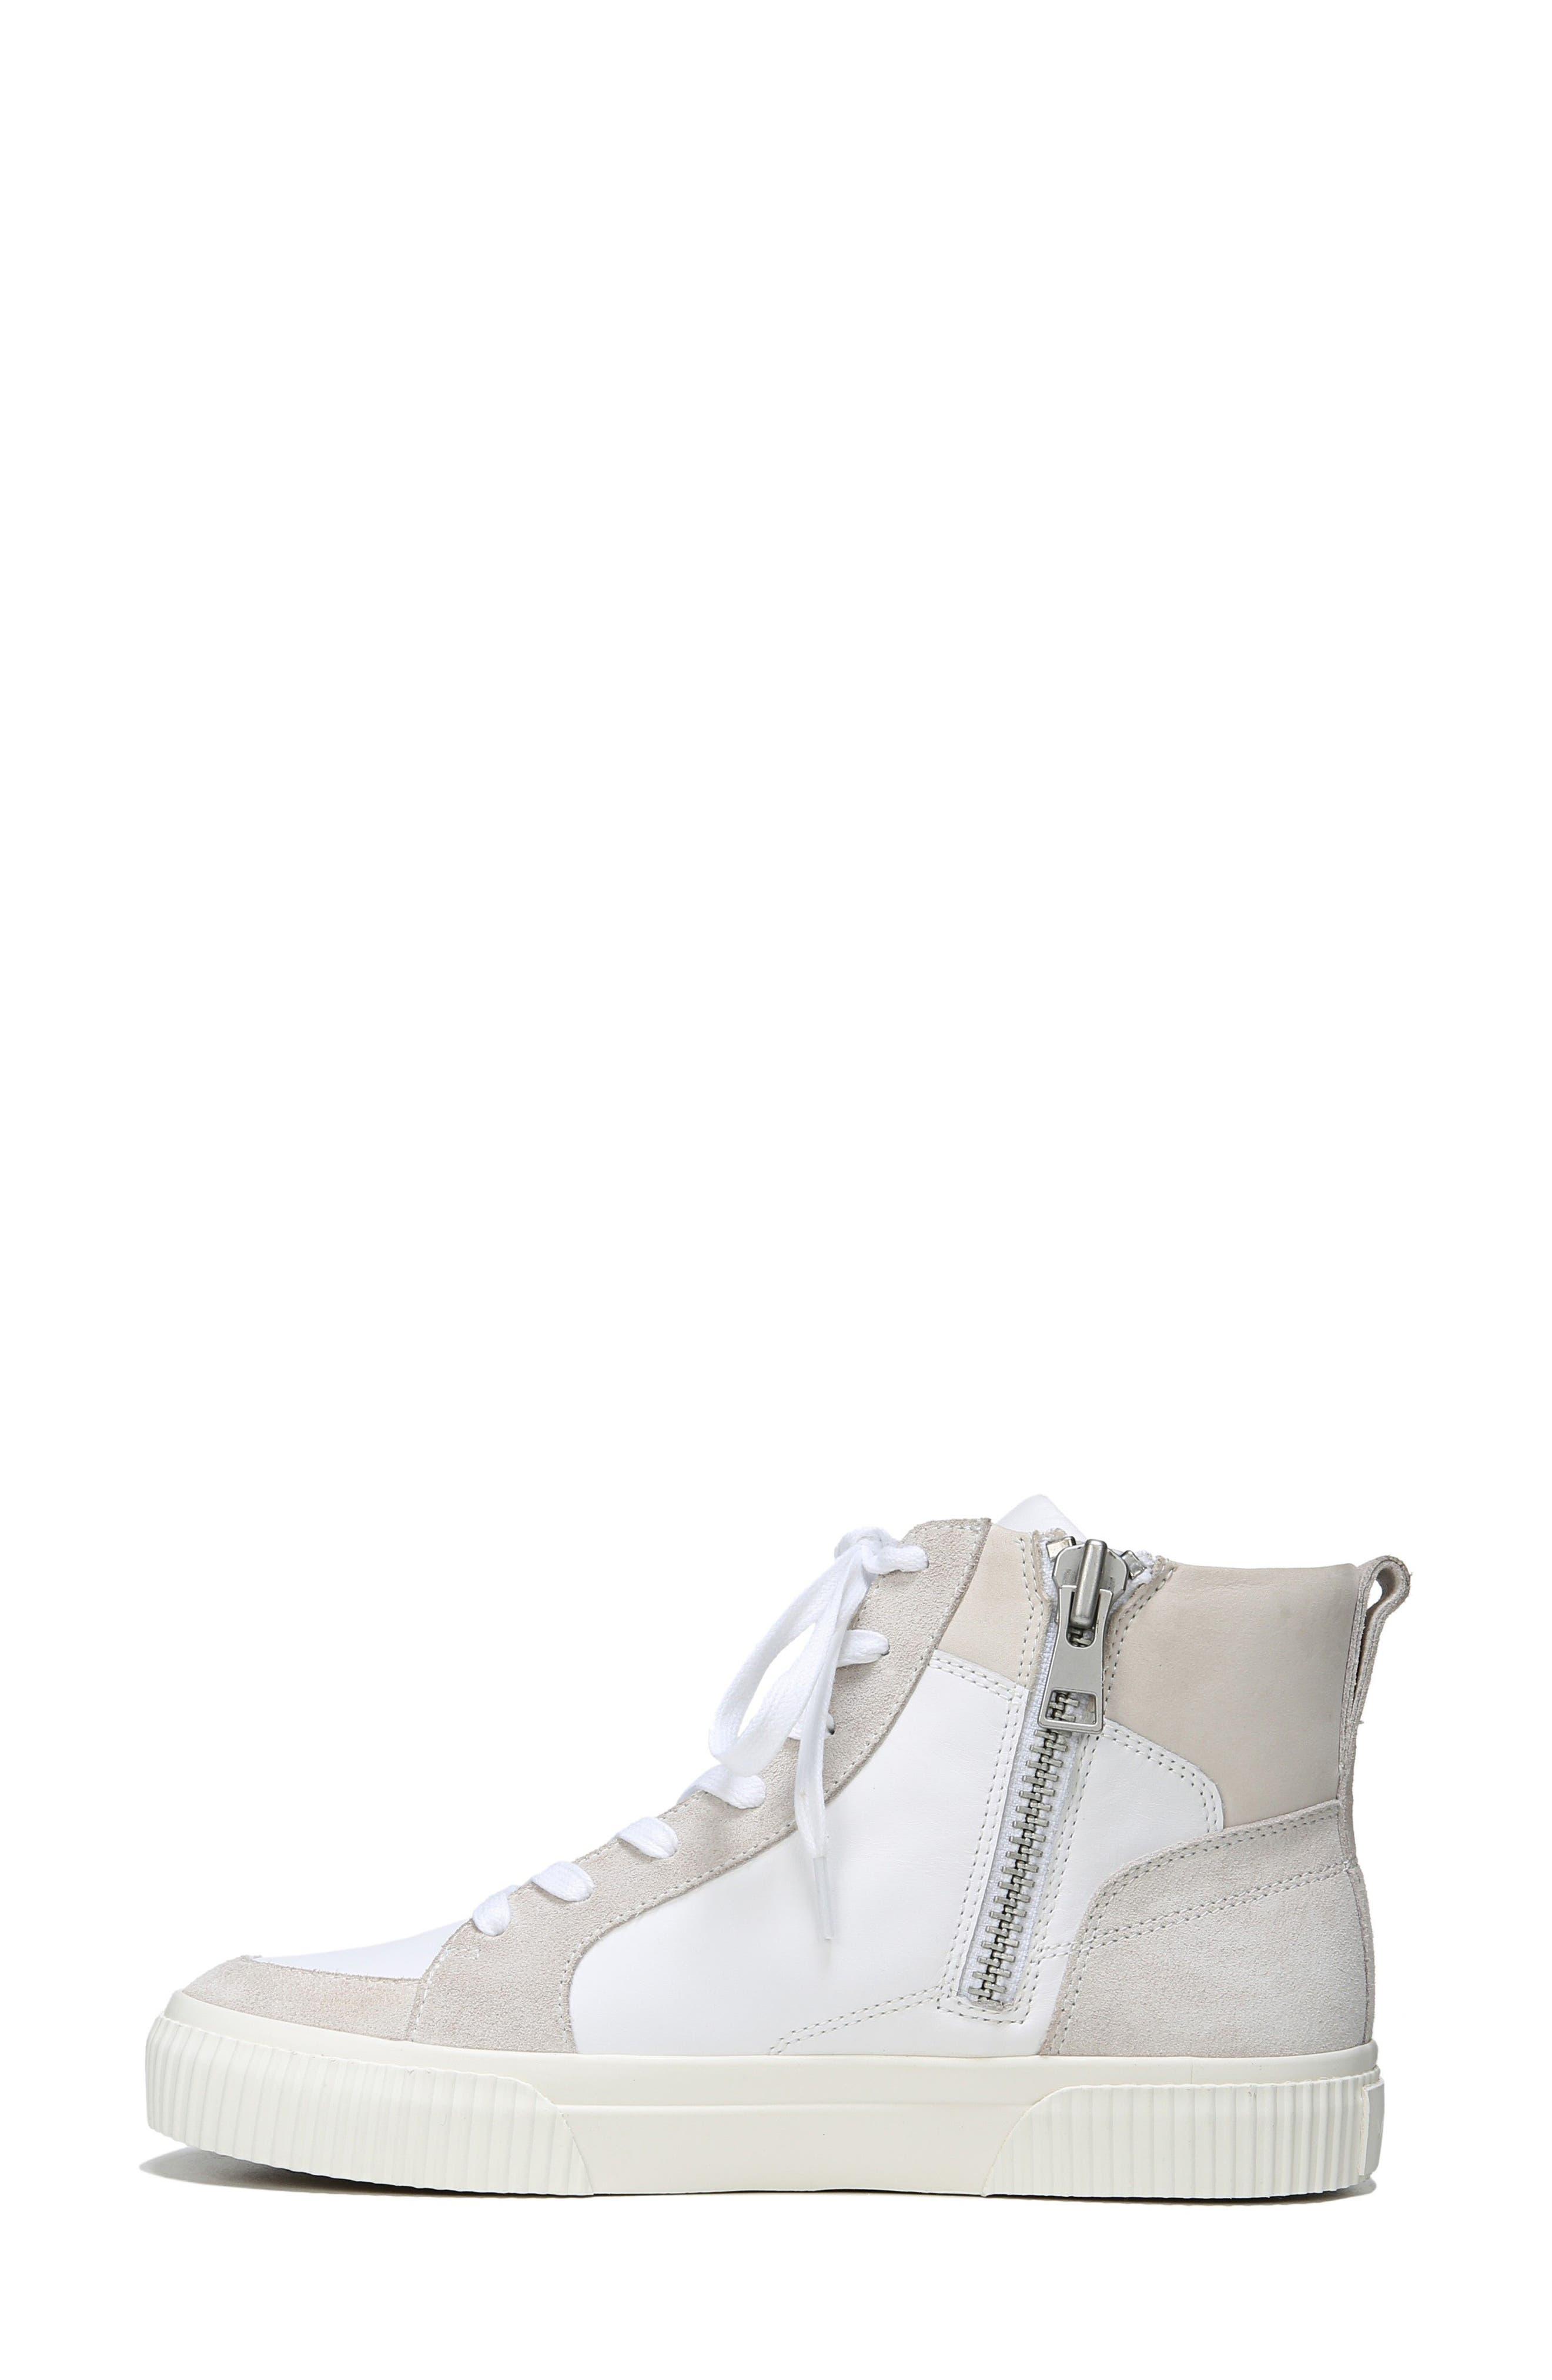 Kiles High-Top Sneaker,                             Alternate thumbnail 3, color,                             100